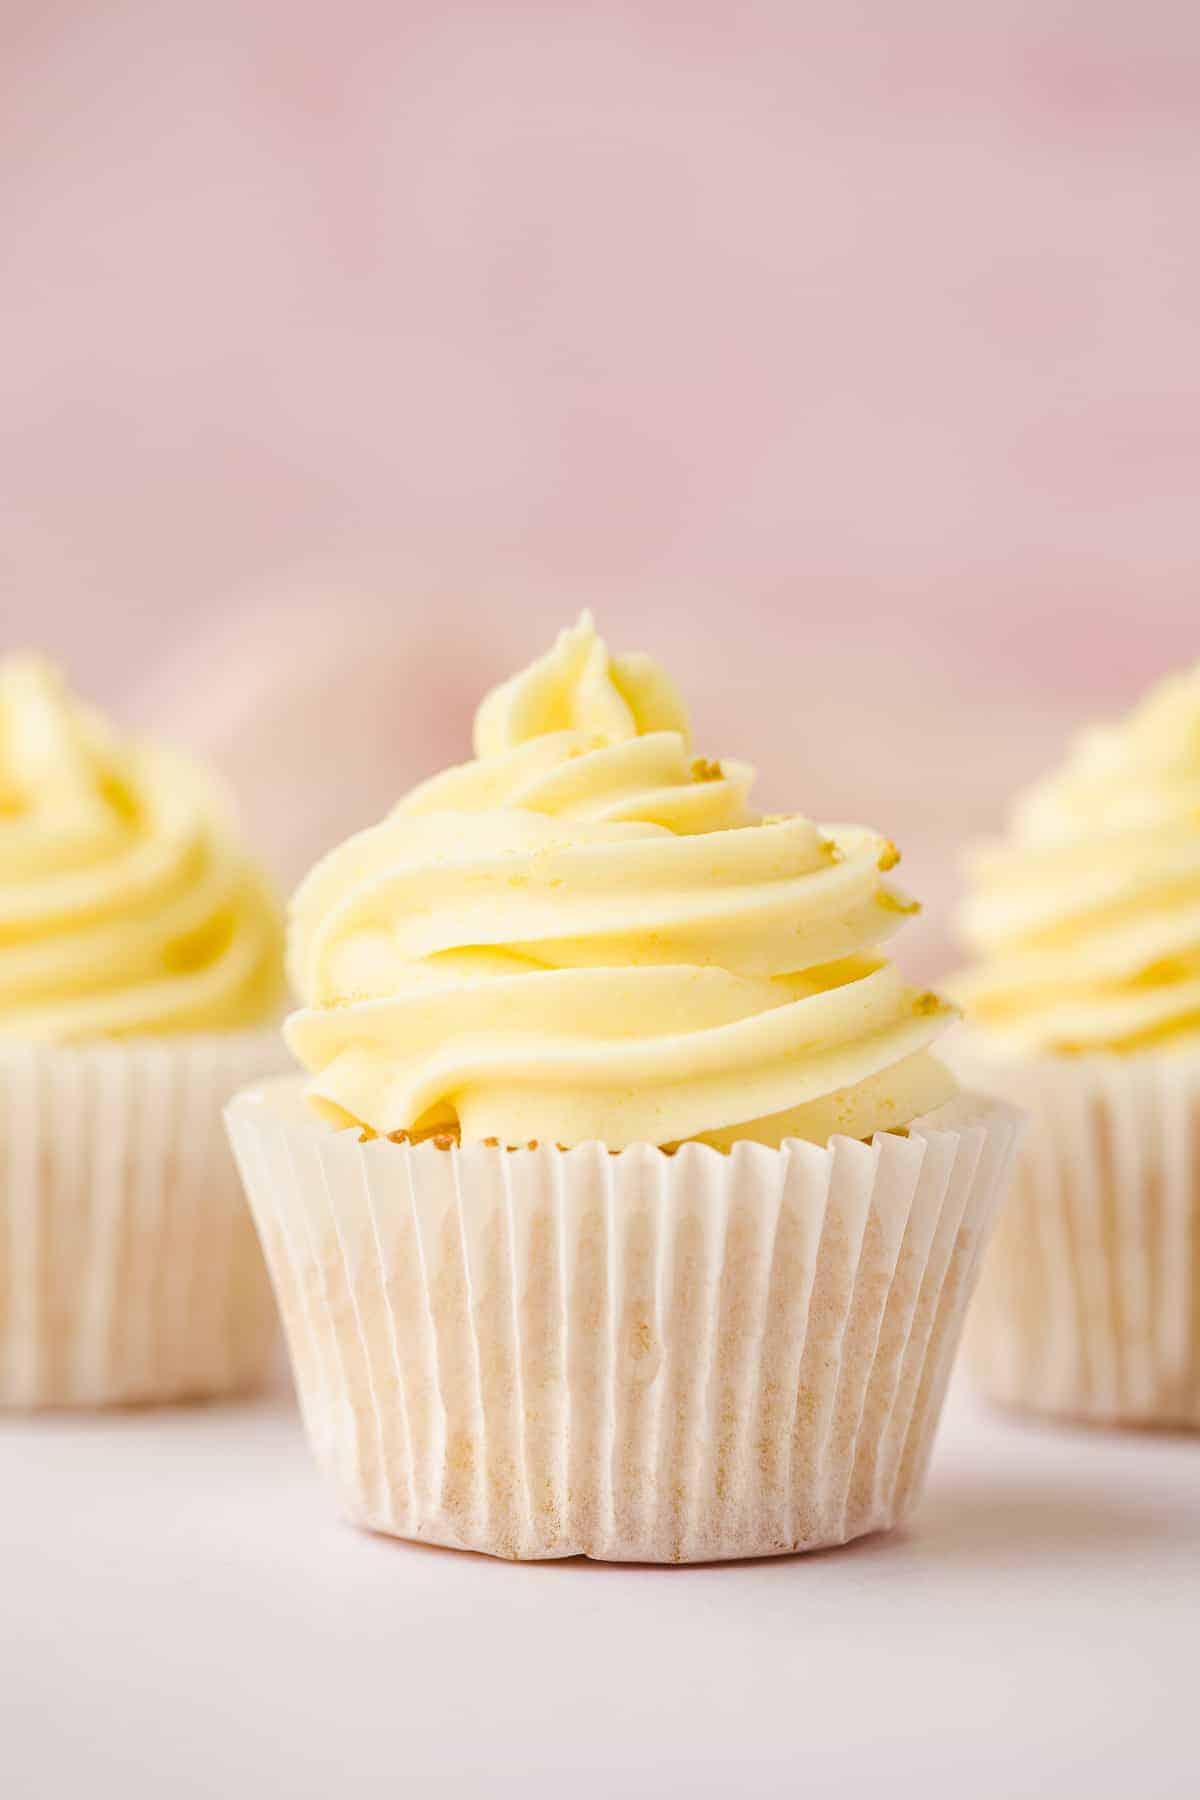 Zesty lemon cupcakes.